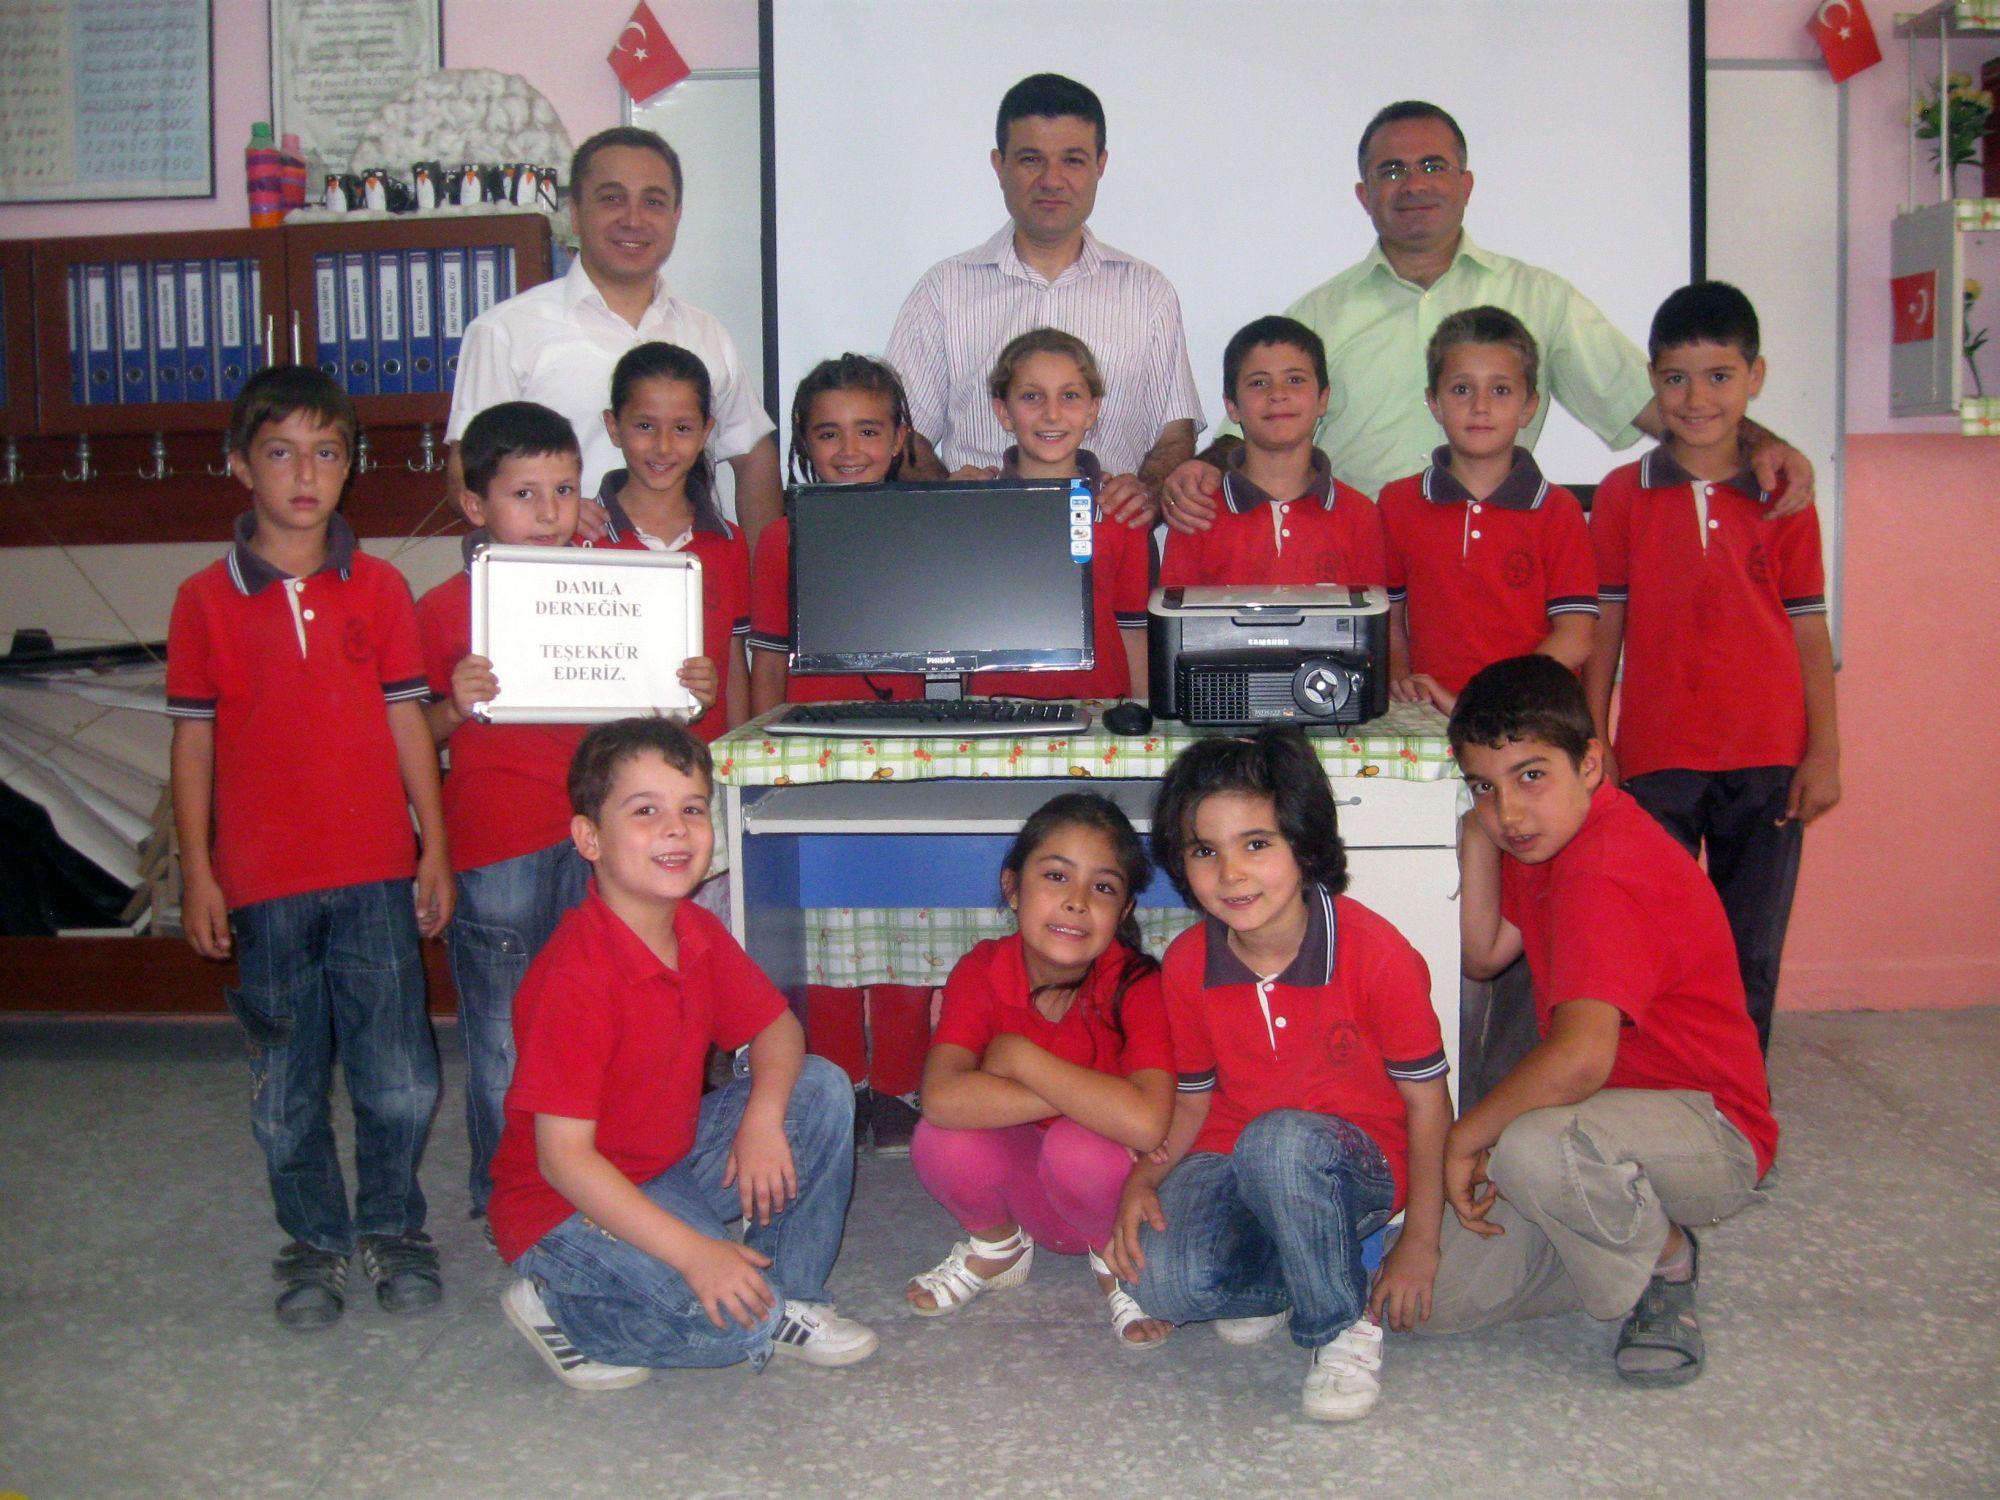 Hacı İrfan Mersin İ.Ö.Okulu-Sarayköy.jpg